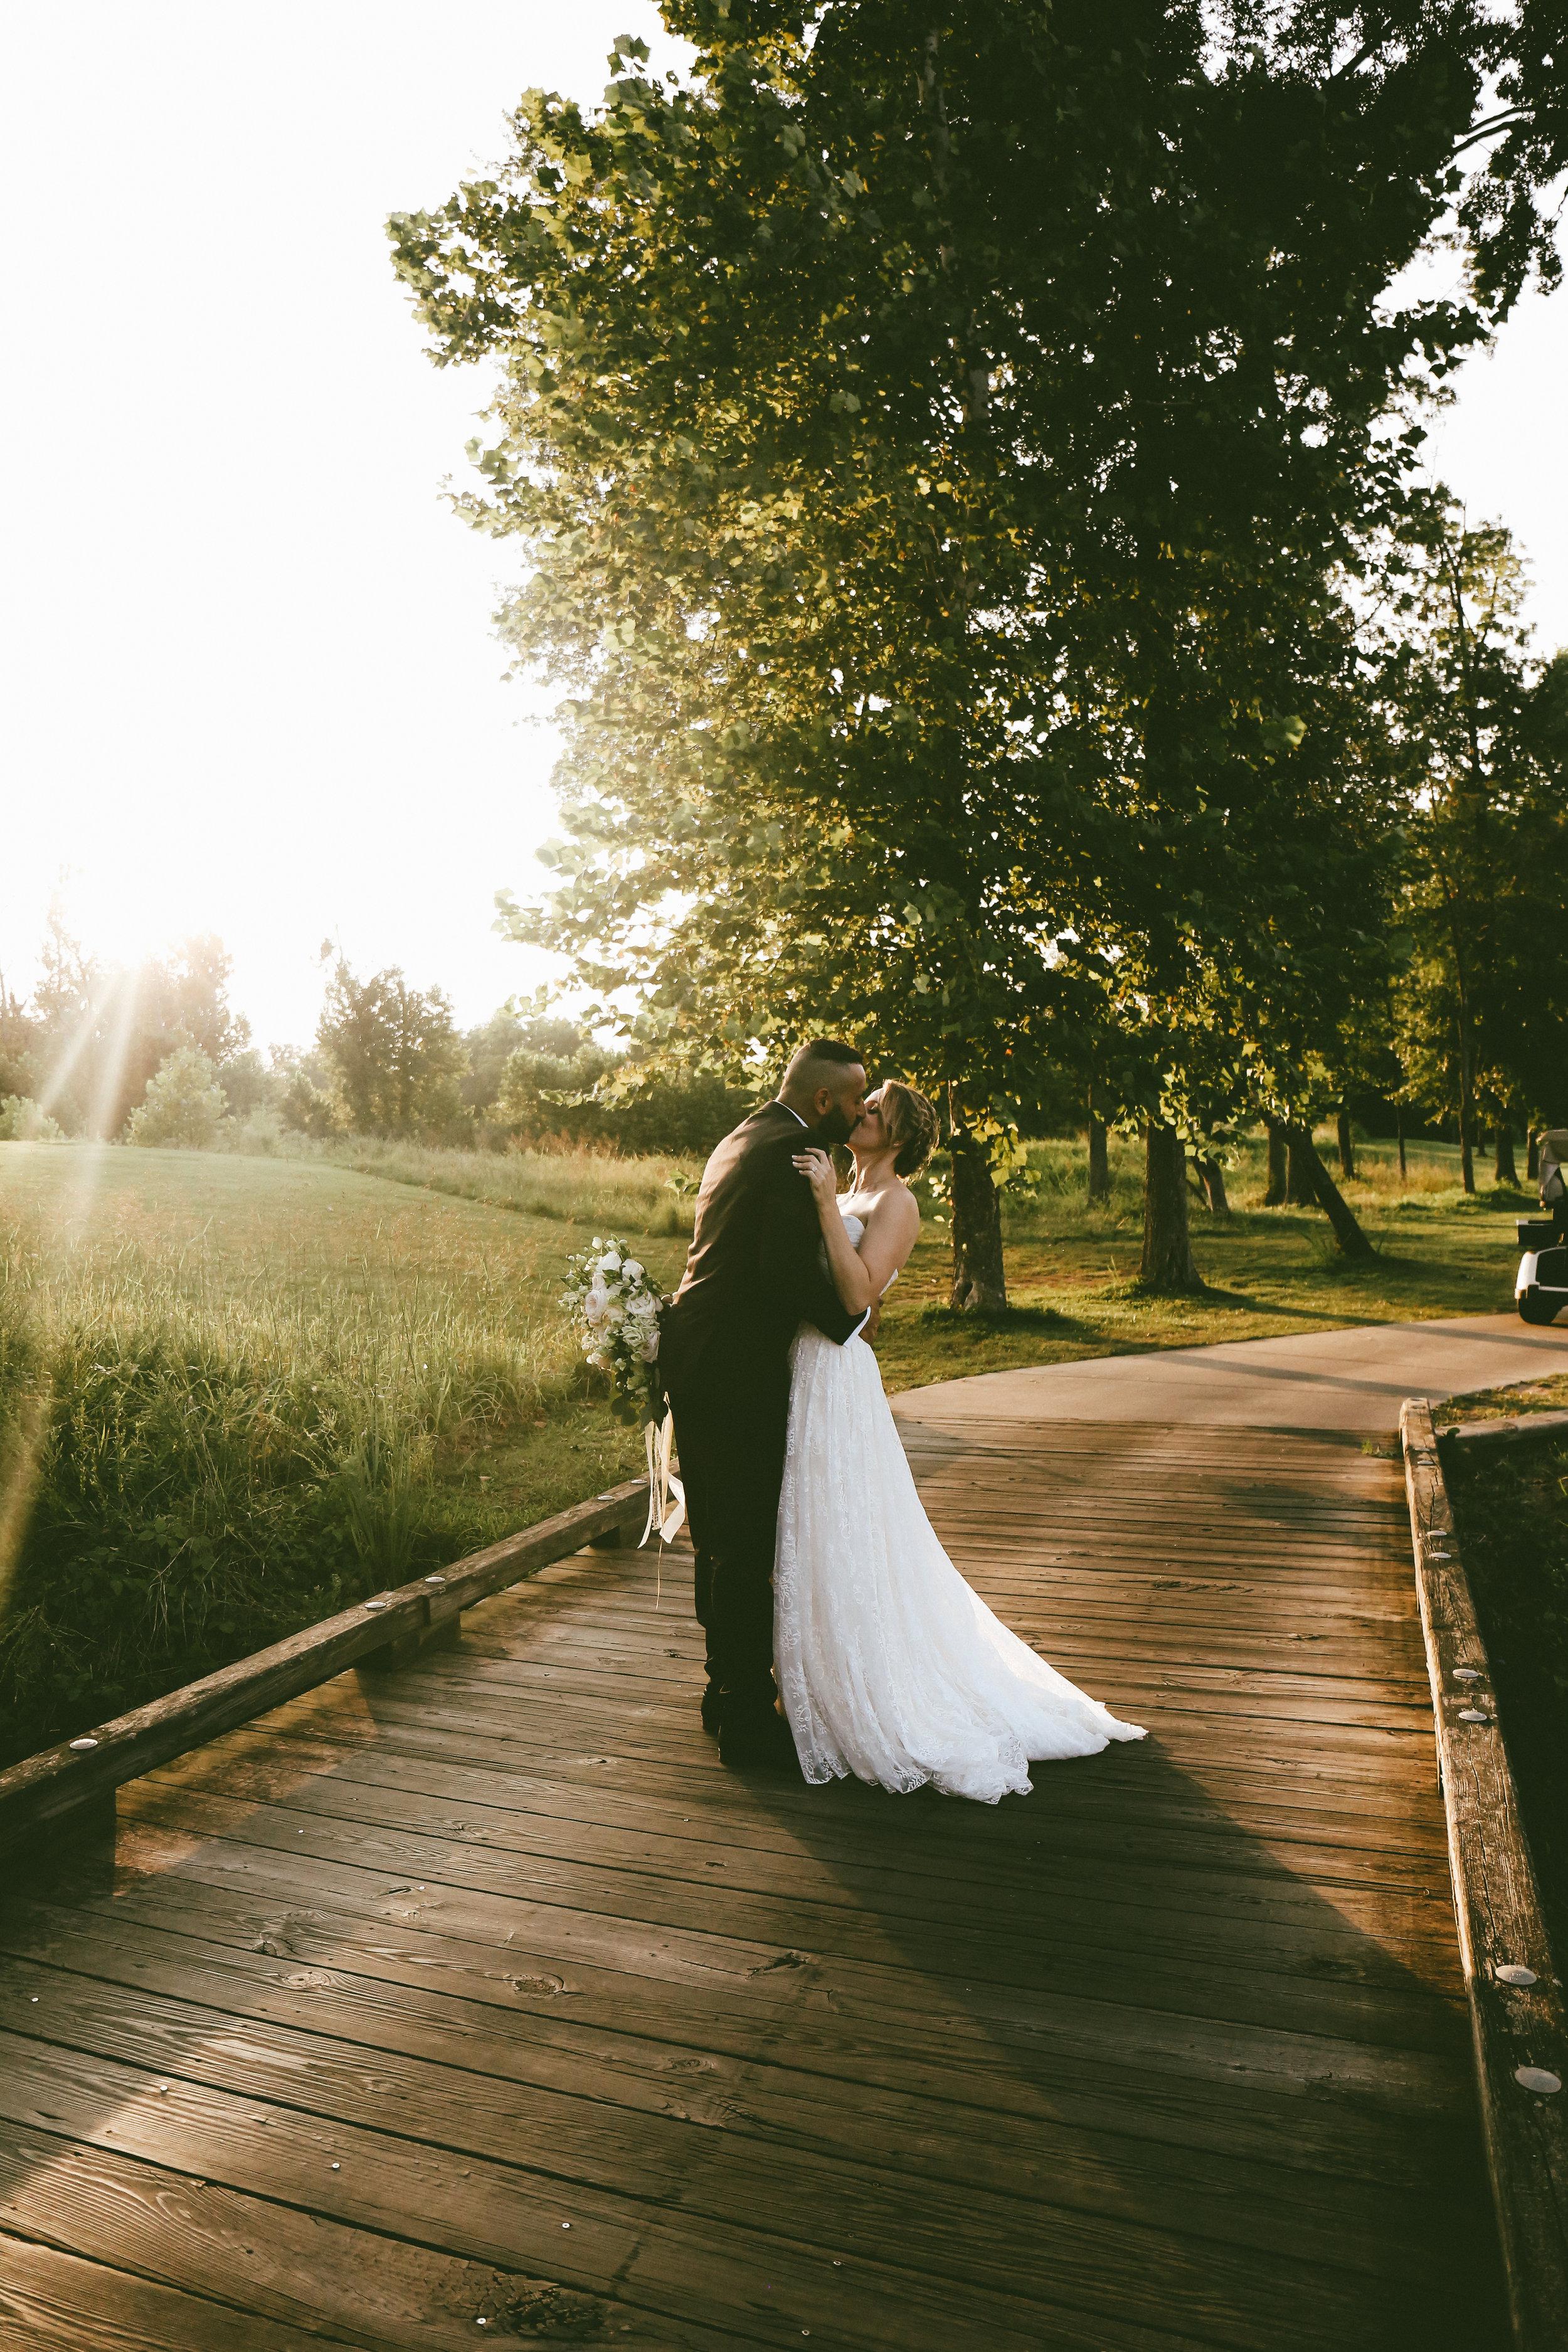 BaileyMena_Married - 378.jpg